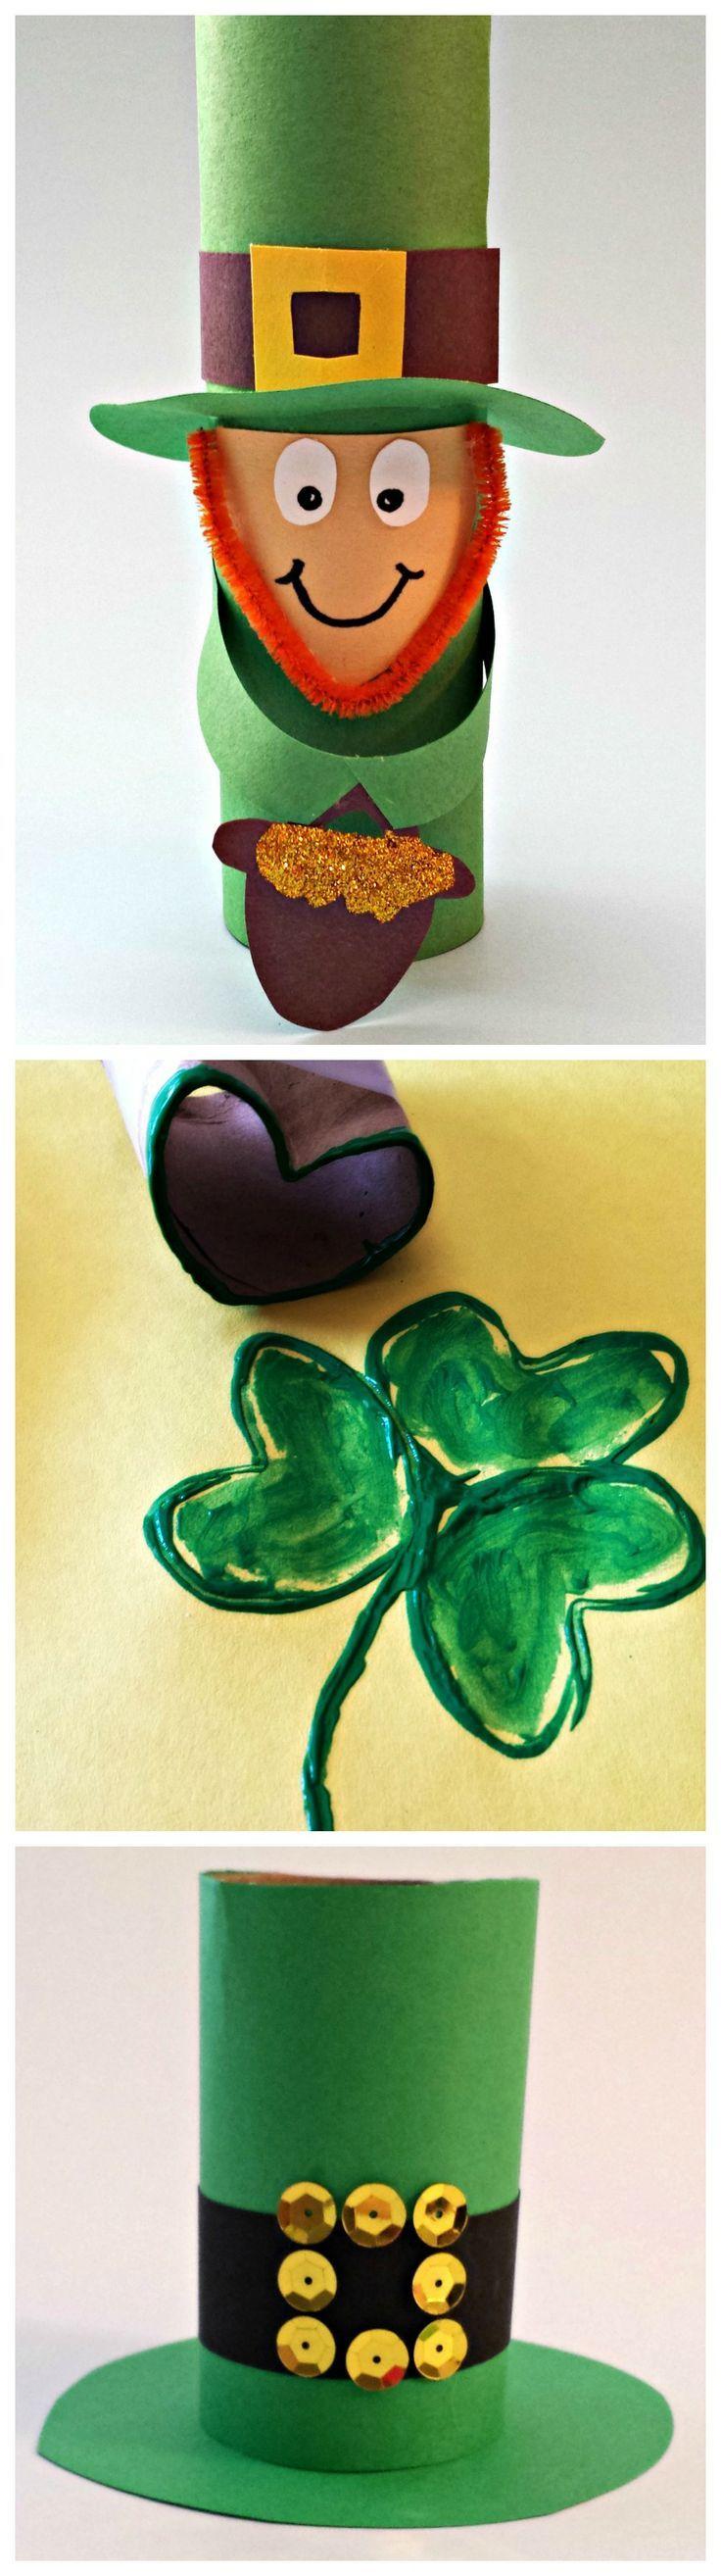 St. Patricks Day Toilet Paper Roll Crafts for Kids (Leprechaun, shamrock, hat) #DIY #St pattys art projects | CraftyMorning.com